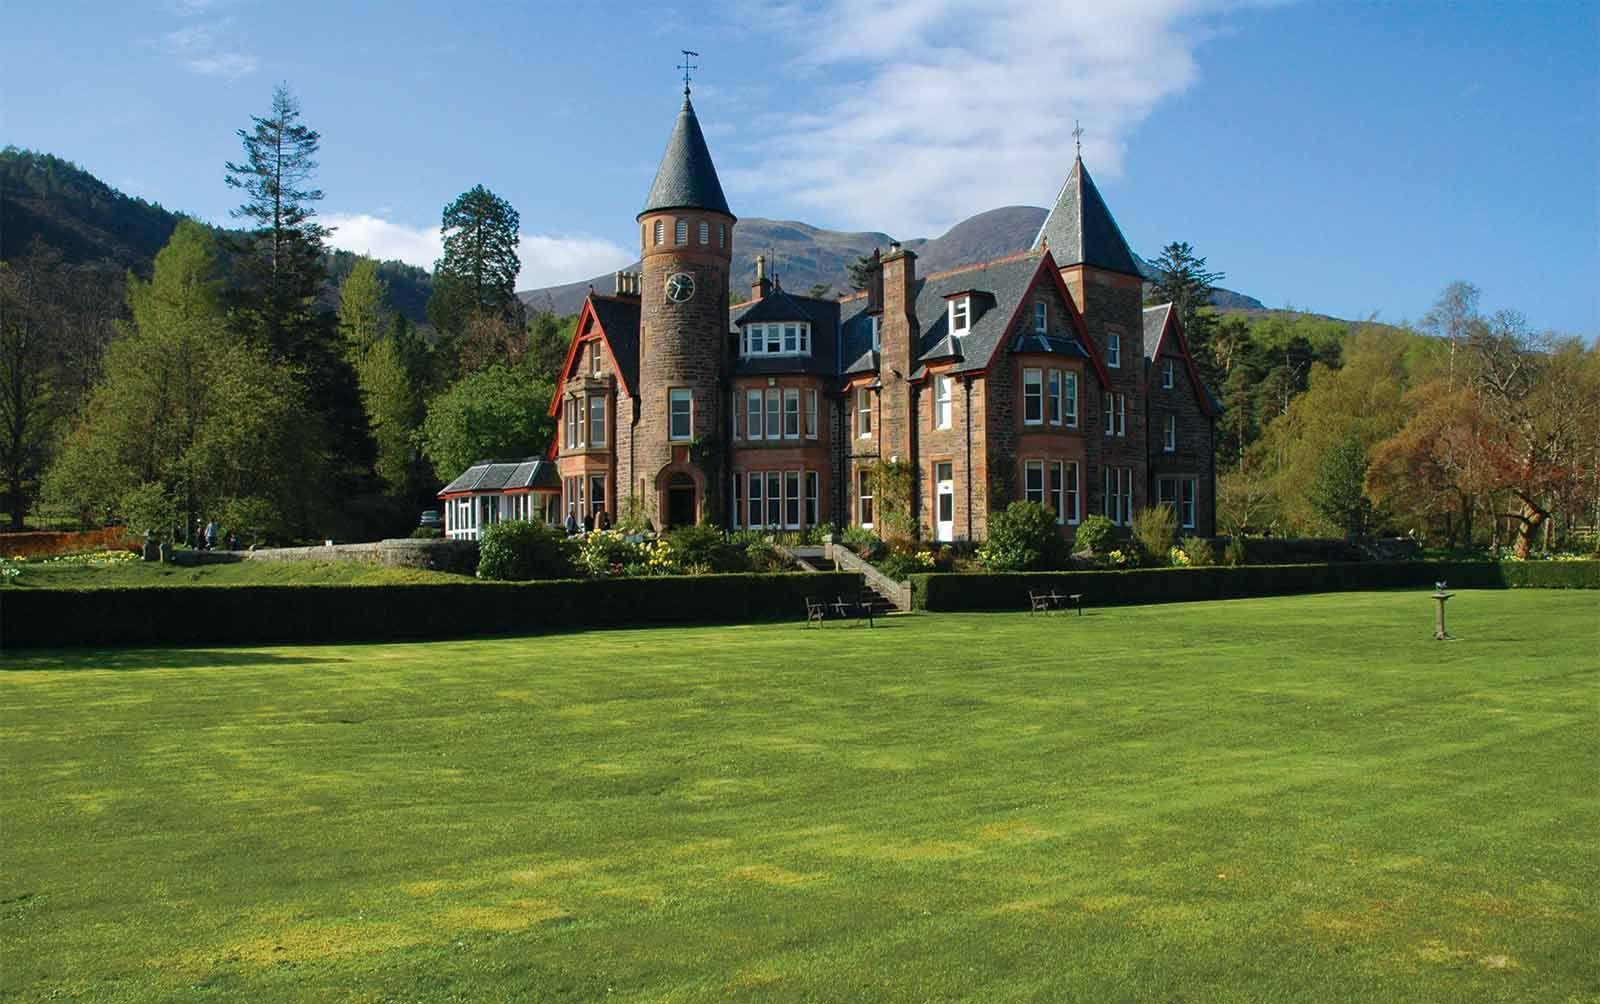 The Torridon Hotel And Inn Luxury Scotland